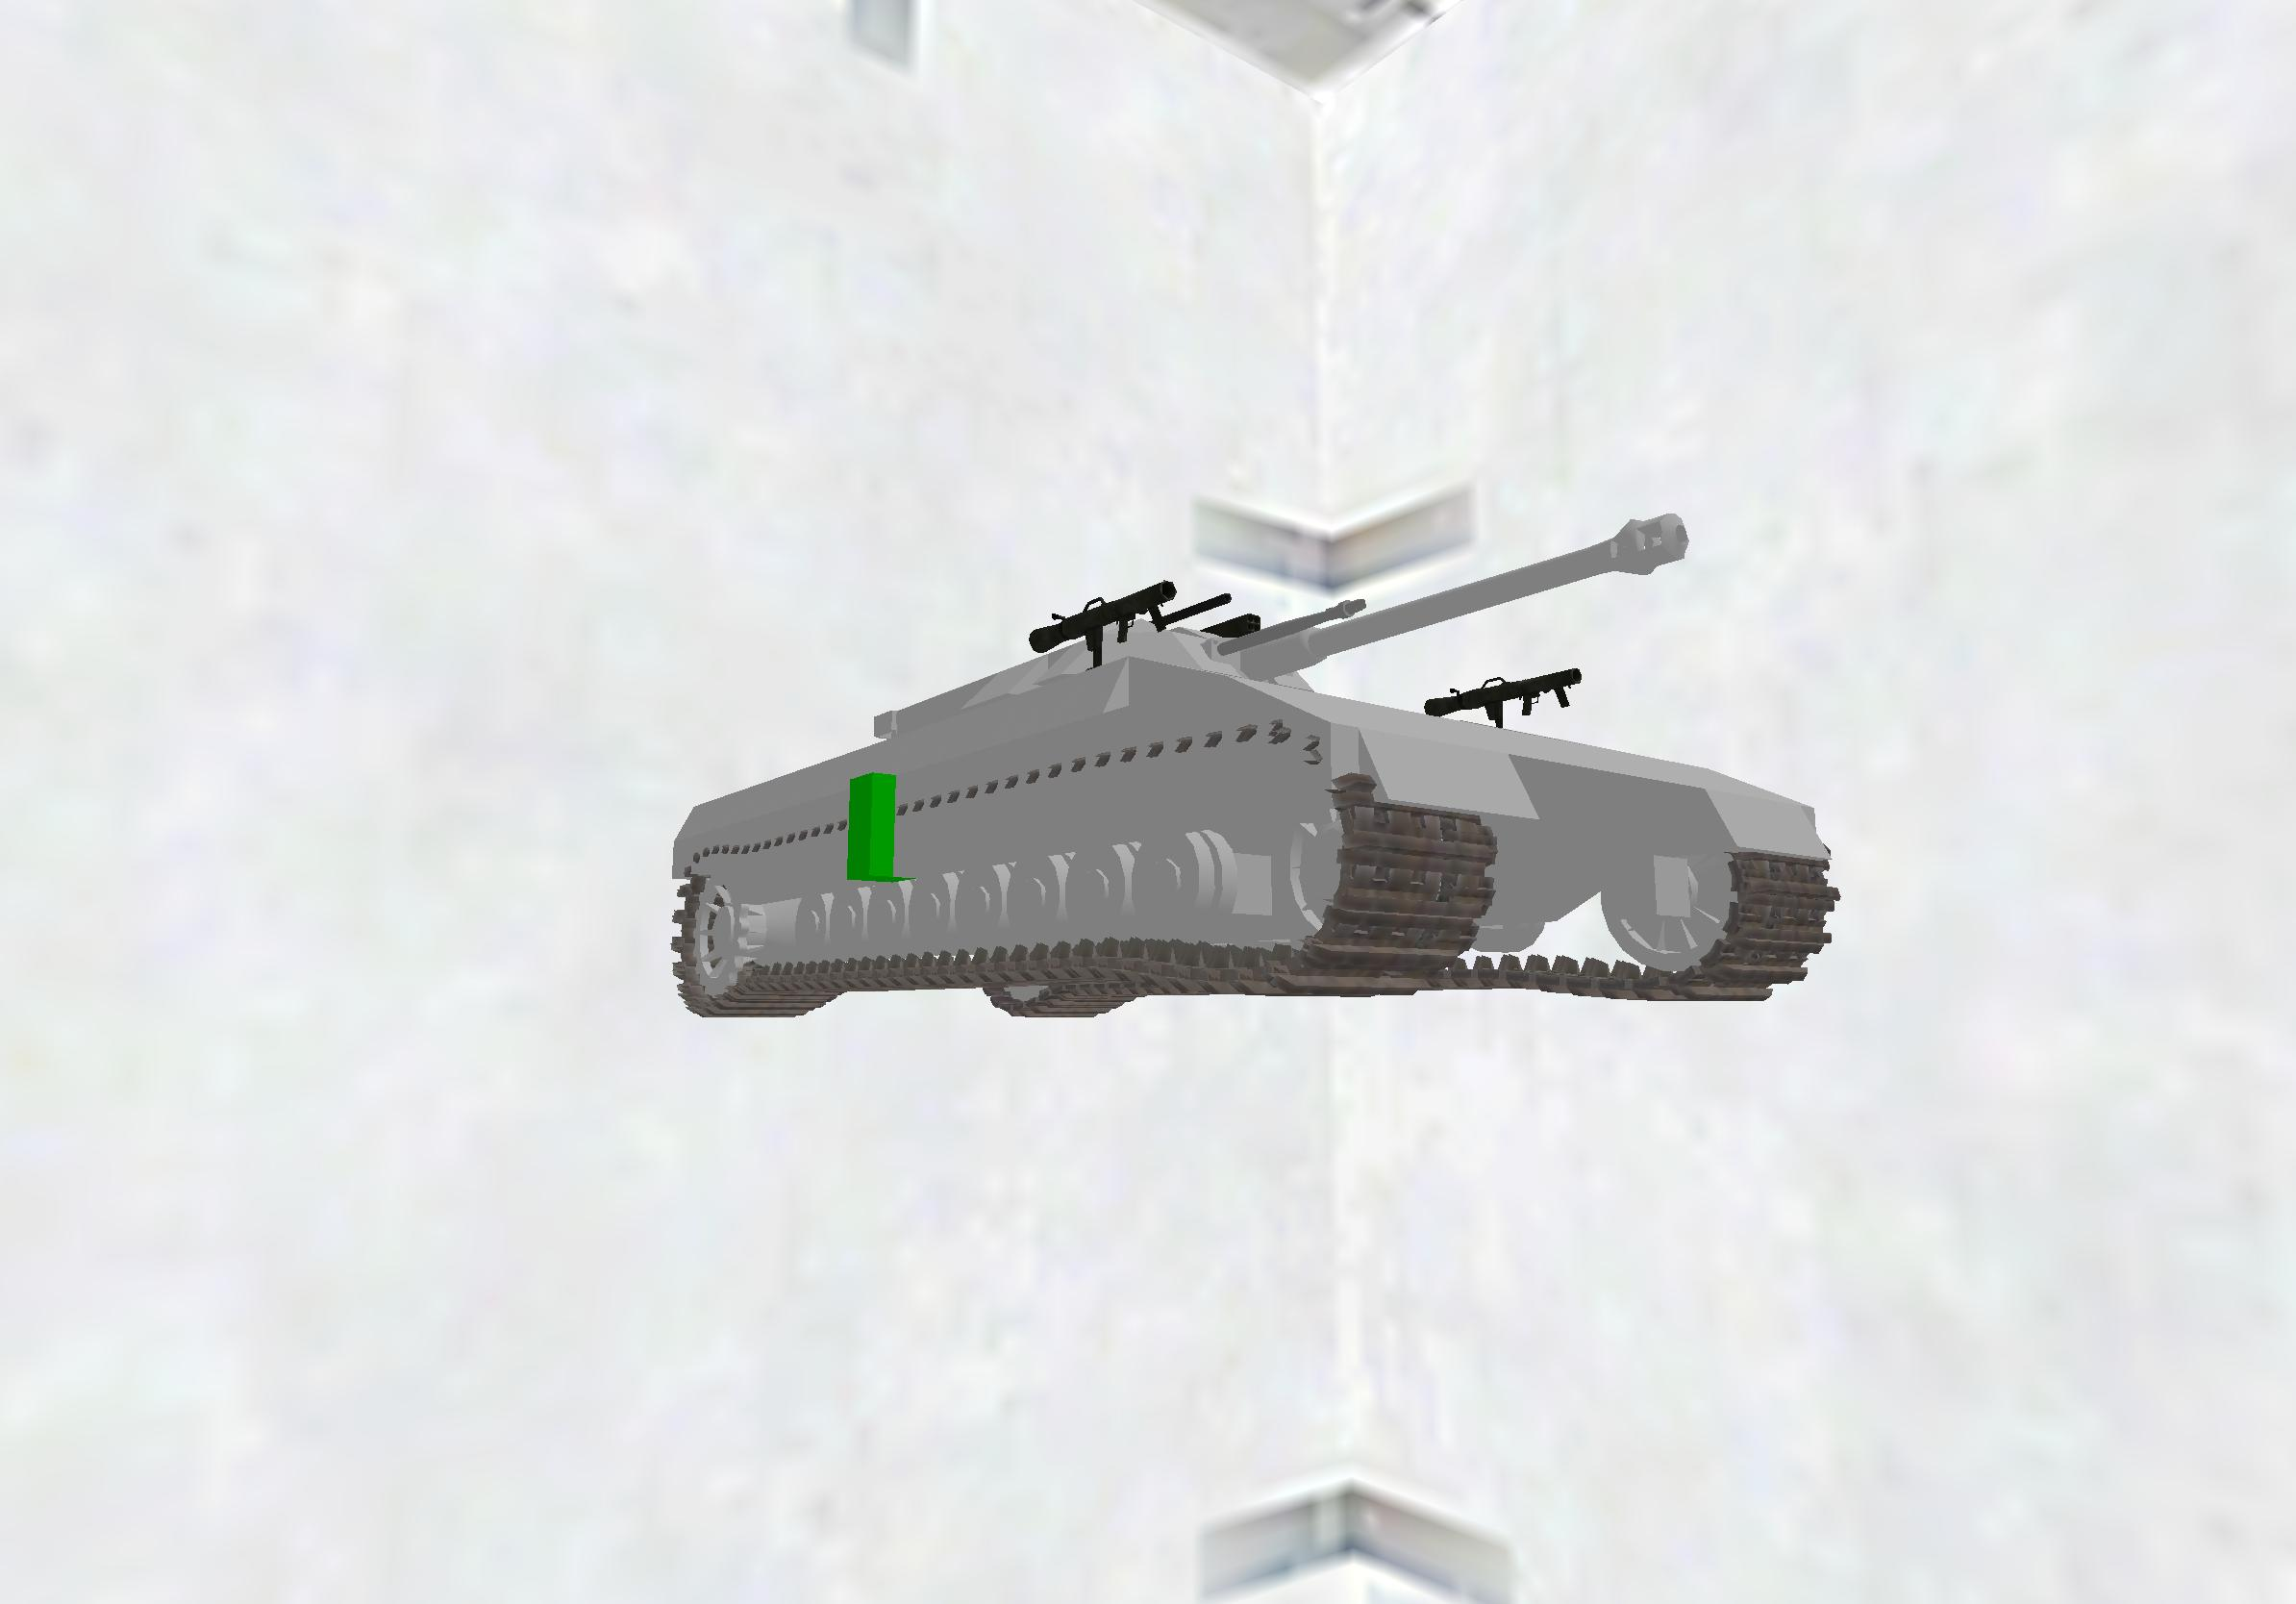 My super tank